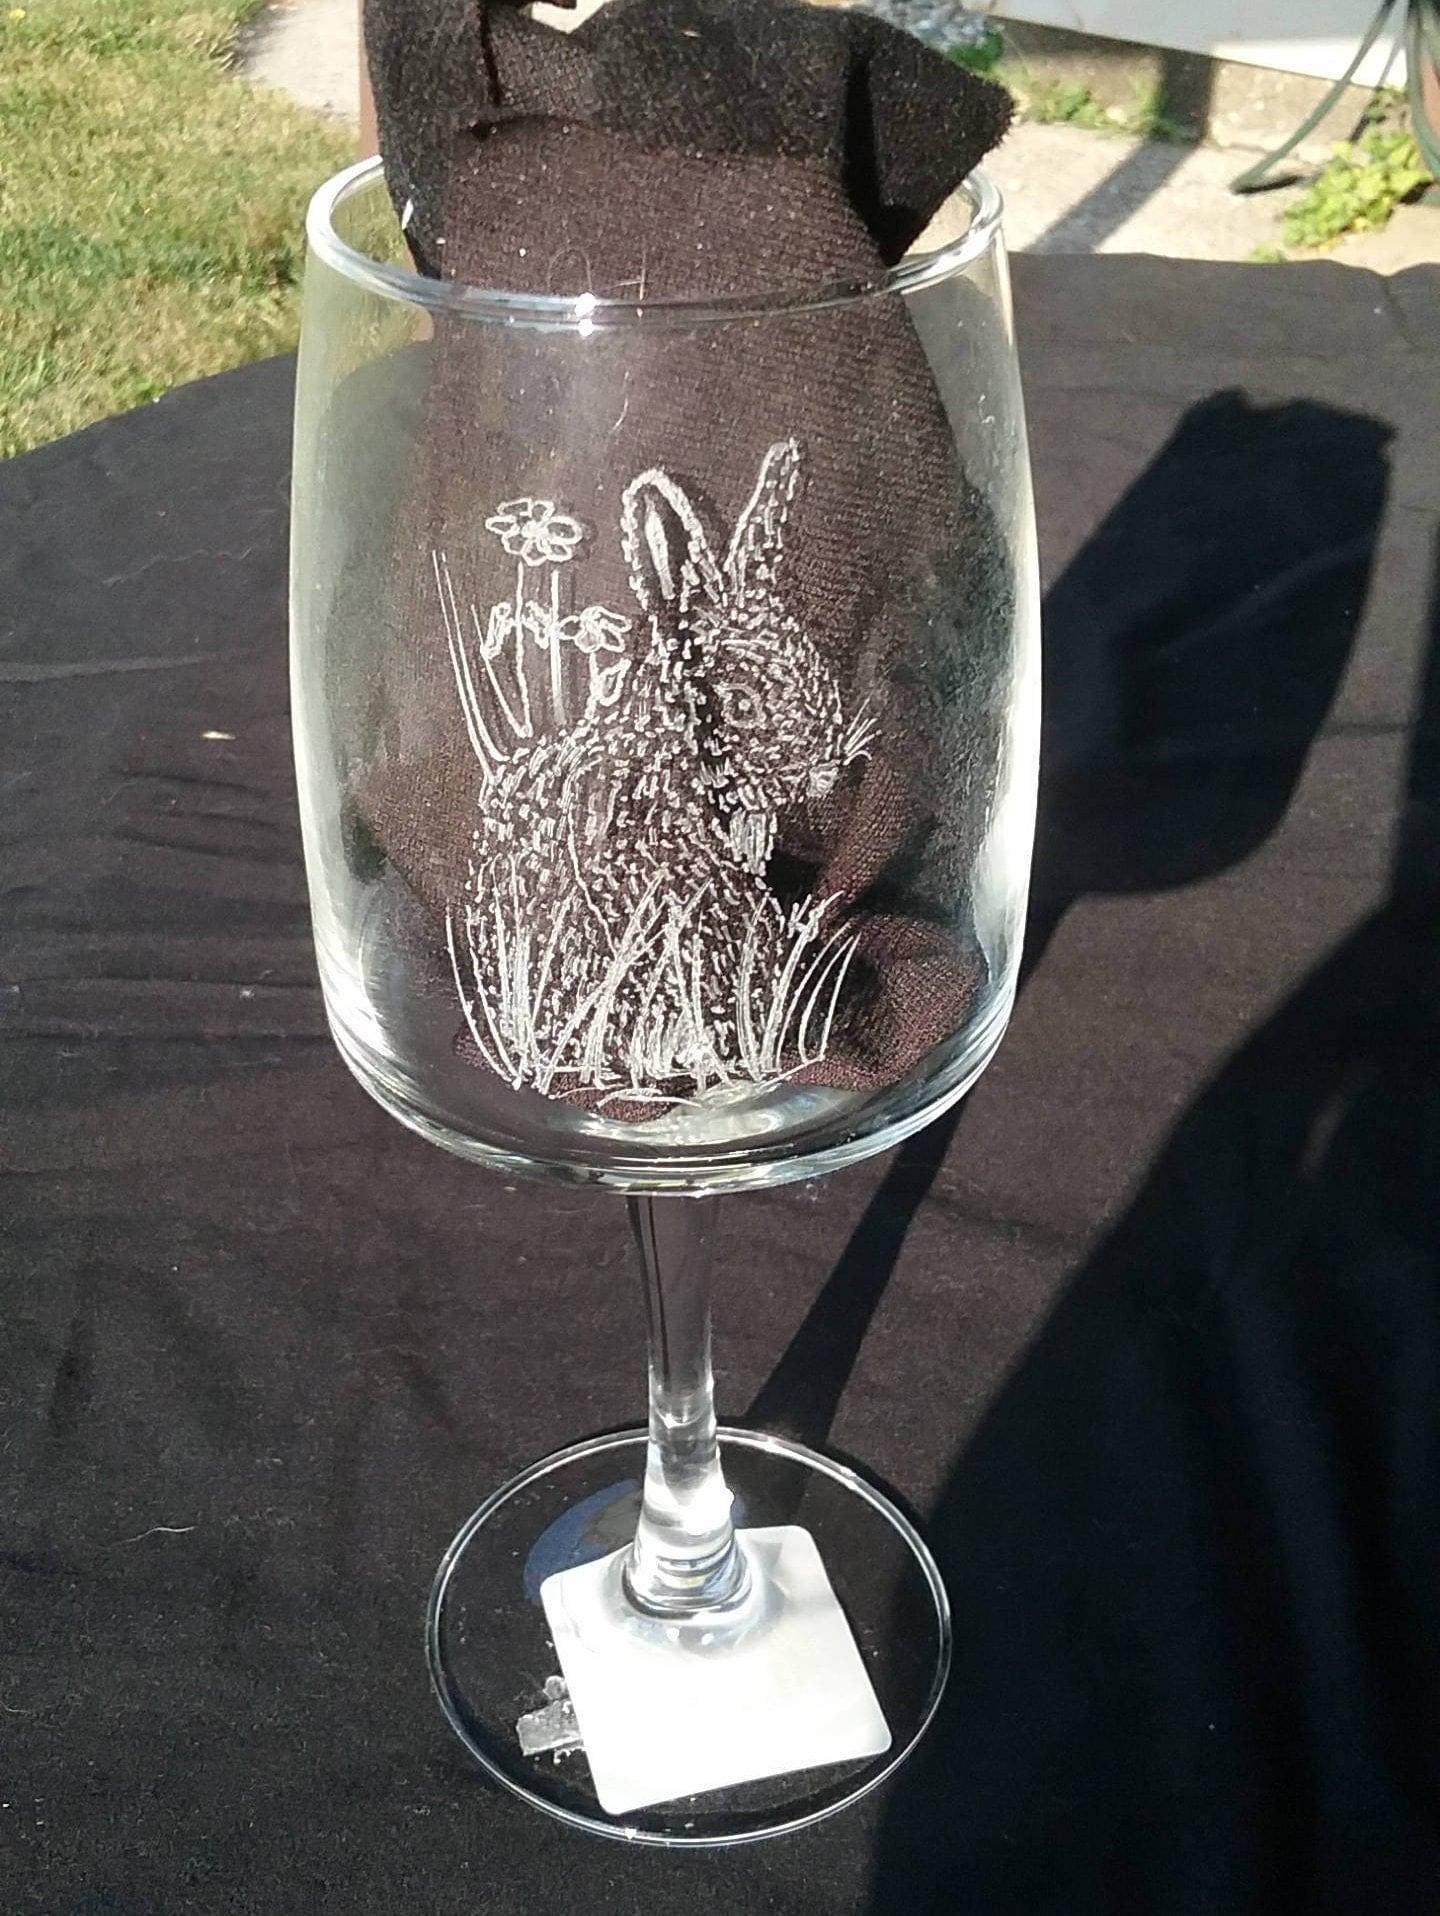 whimsical engraved bunny wine glass engraved rabbit on wine. Black Bedroom Furniture Sets. Home Design Ideas